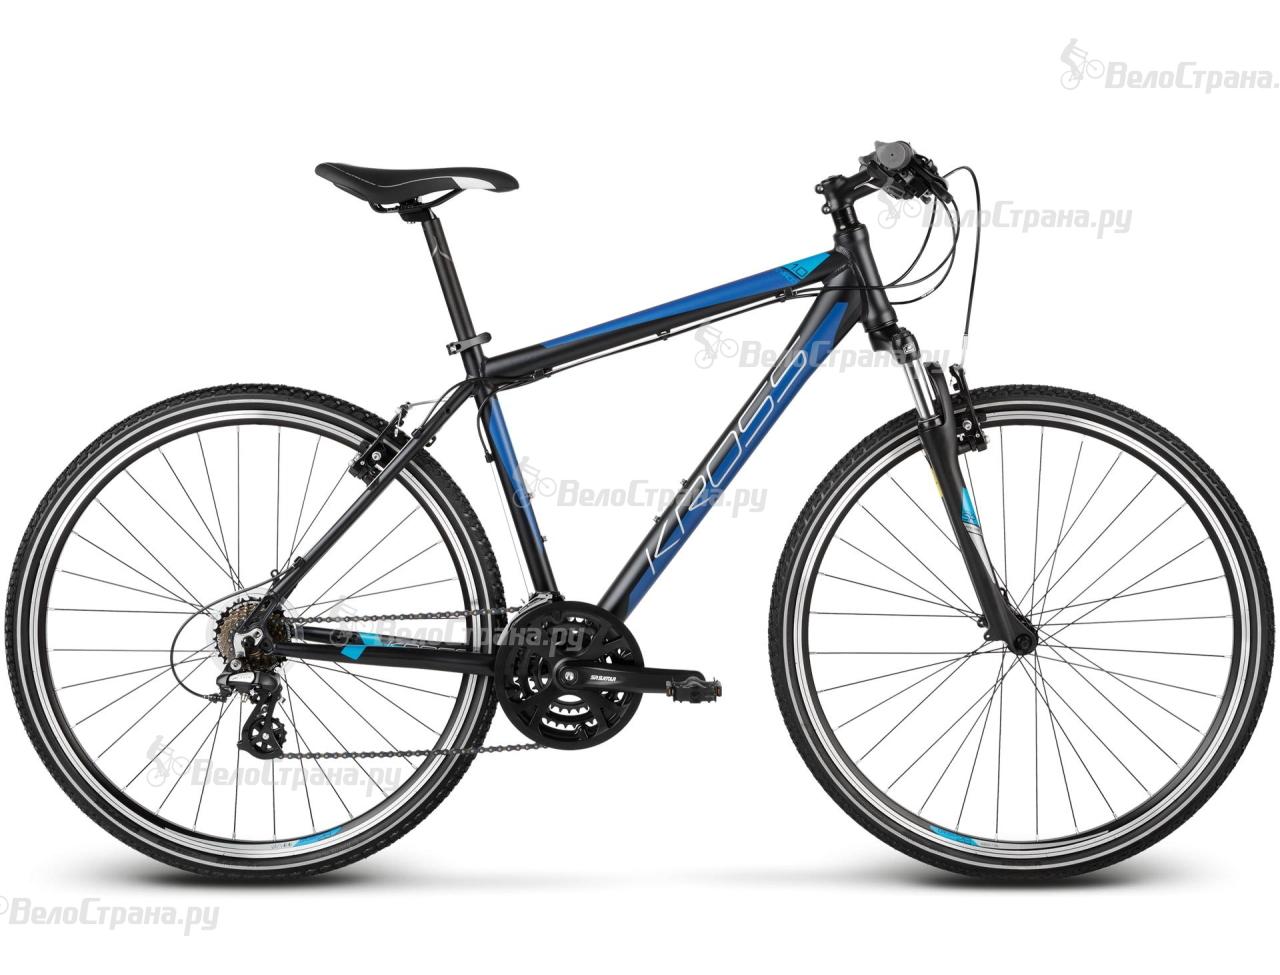 Велосипед Kross Evado 1.0 (2017) велосипед kross evado 6 0 2016